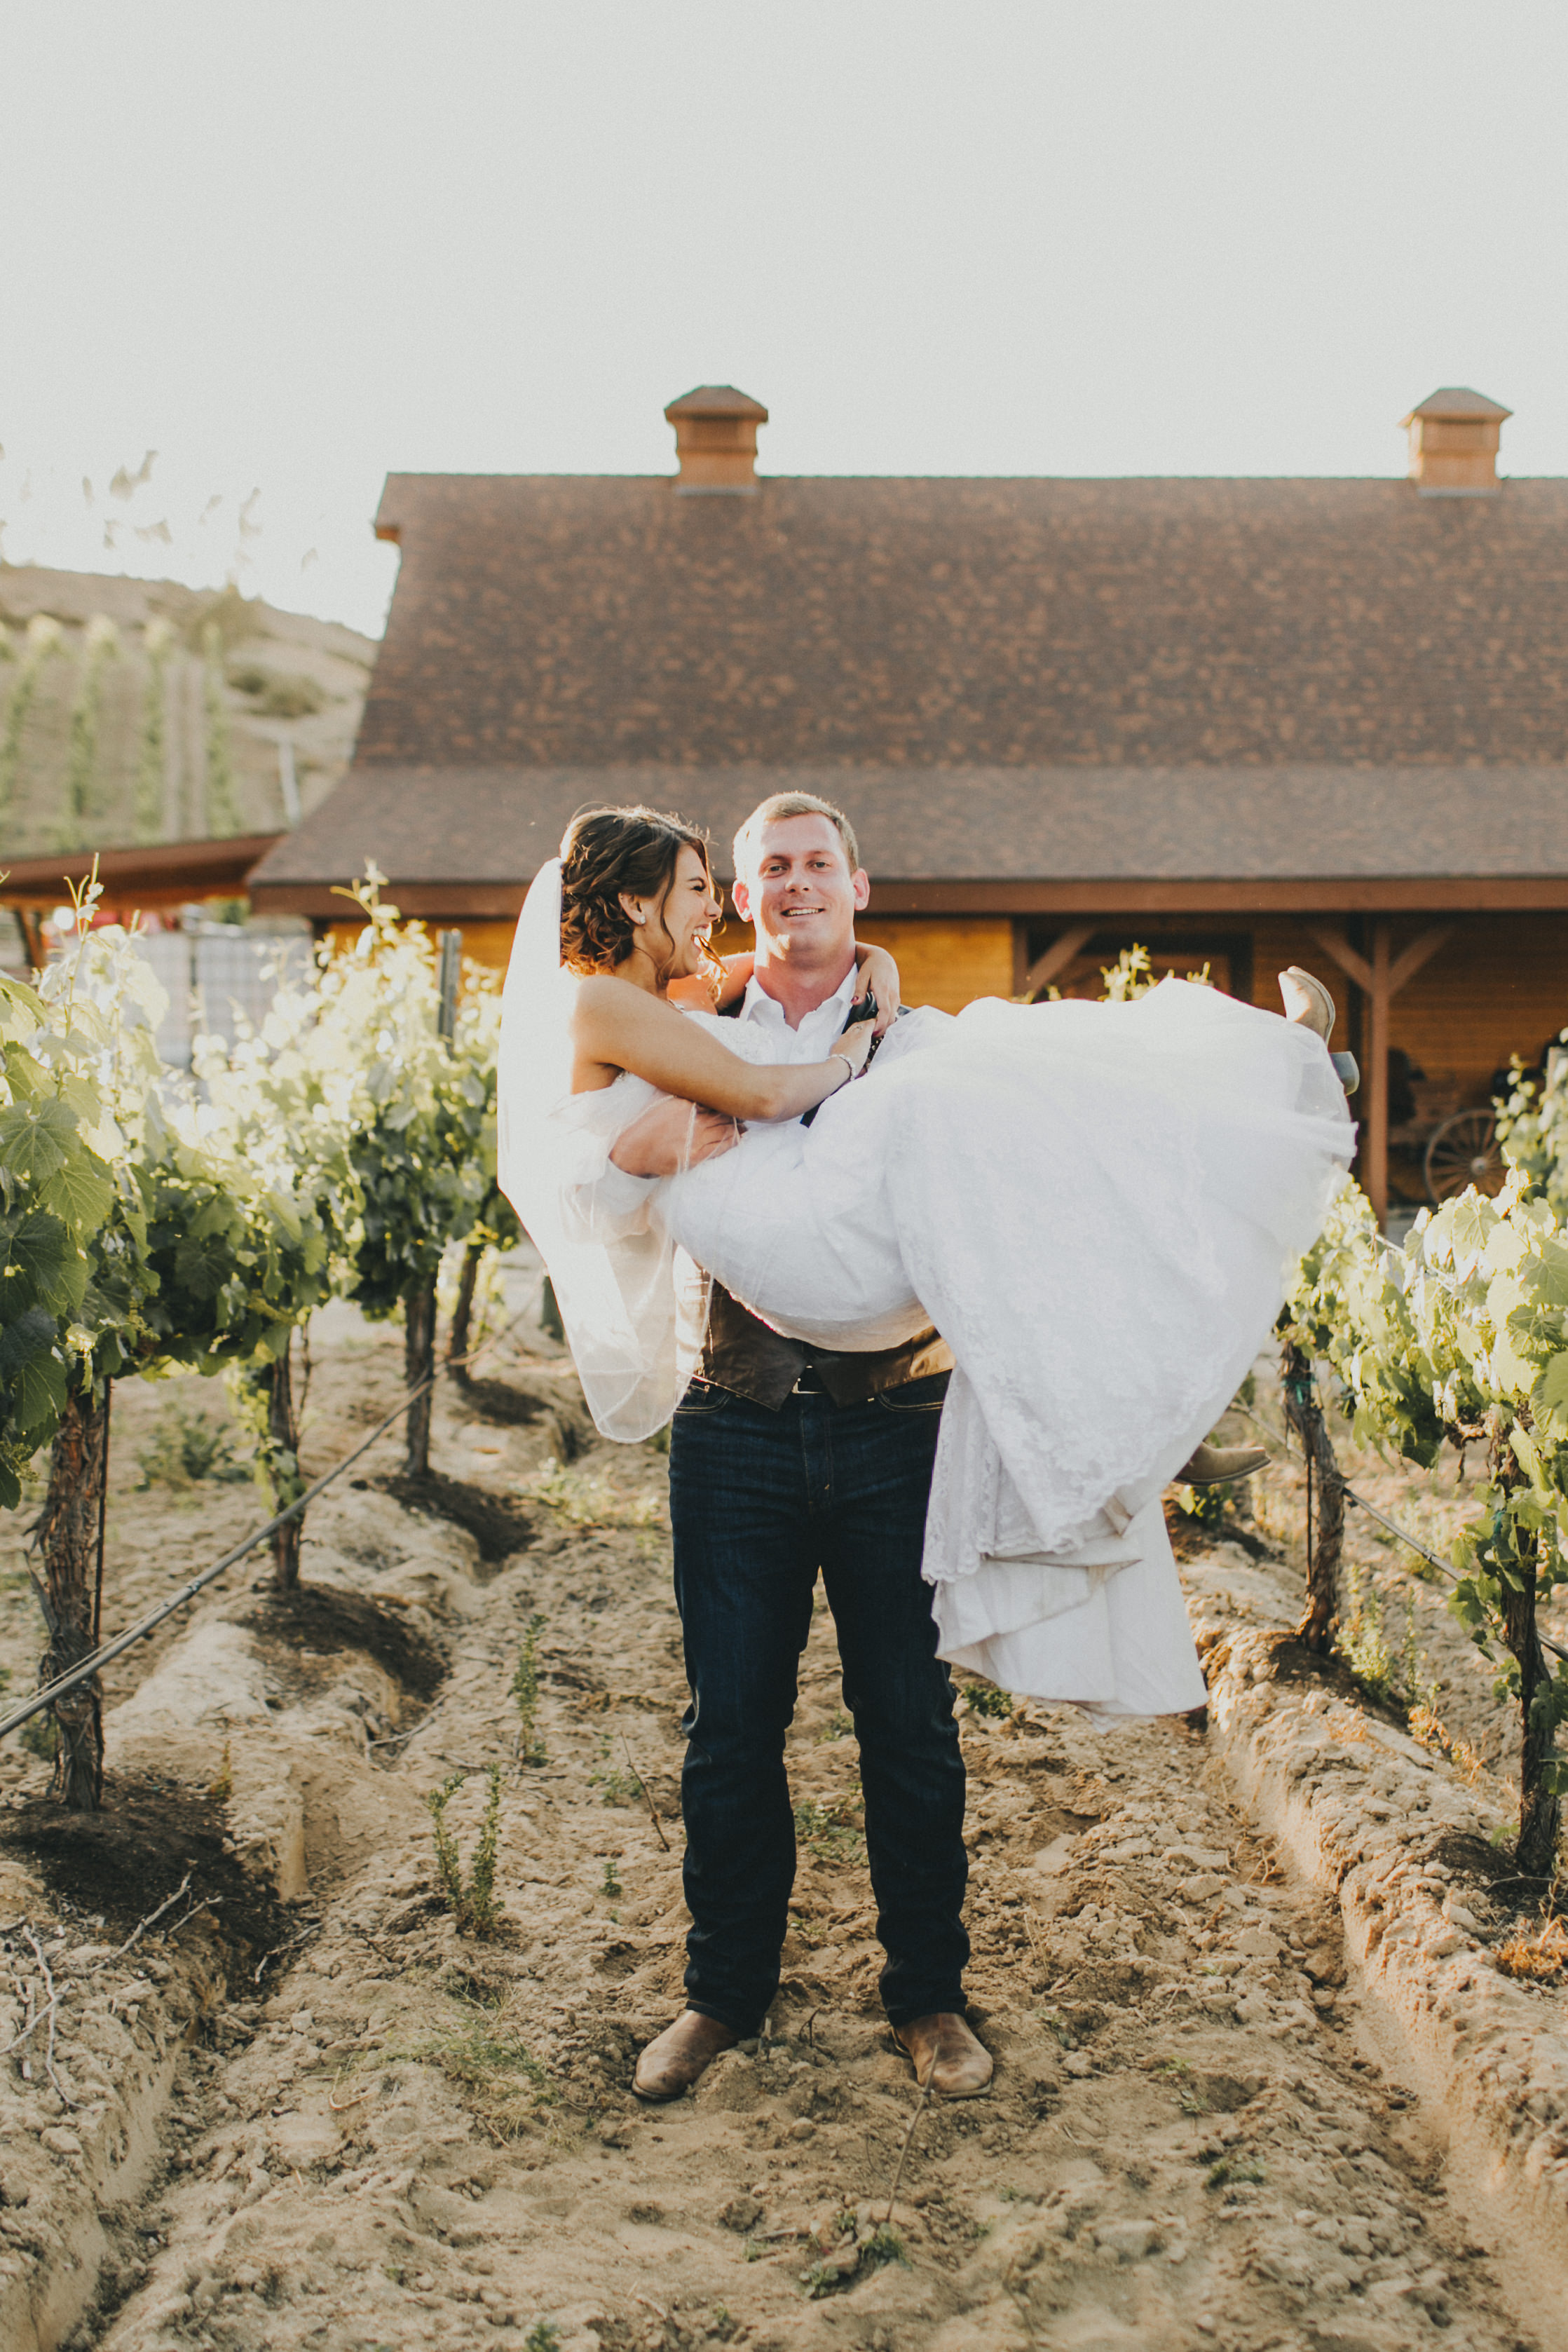 Cheyenne + Jordan - Wedding, Natalie Griffo (88 of 157).jpg